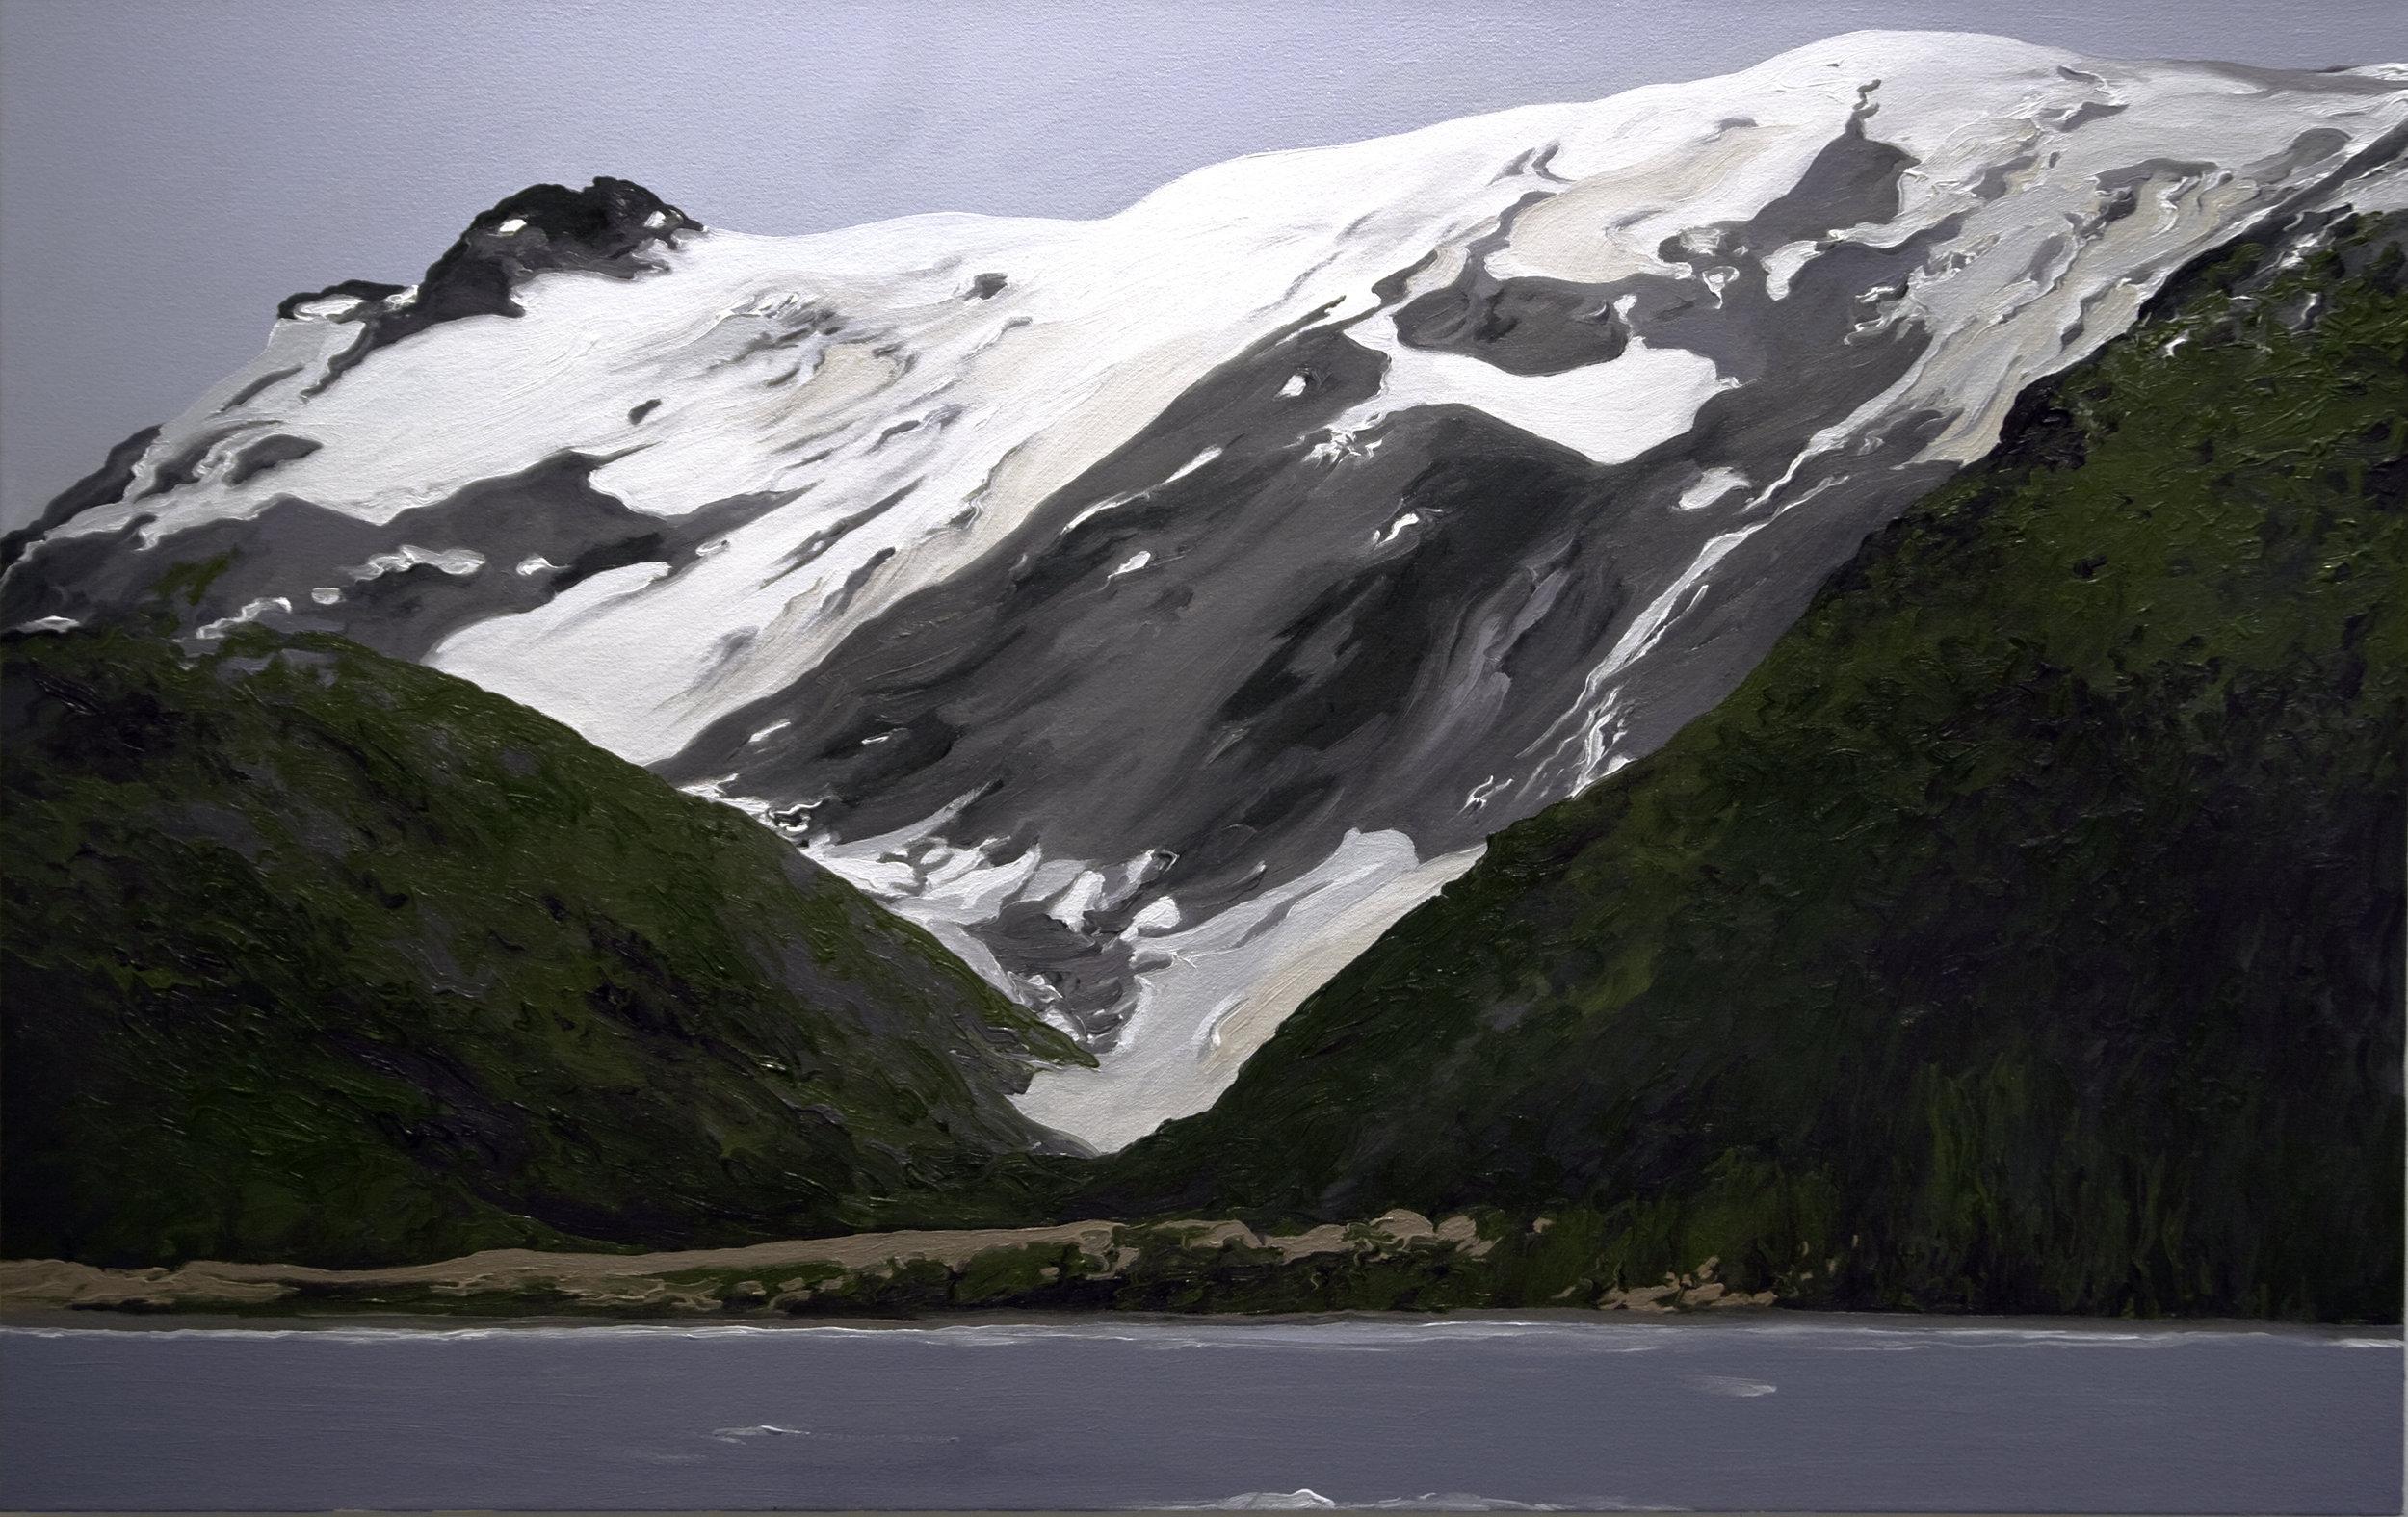 Toboggan Glacier #2, 2000, after Bruce Molnia